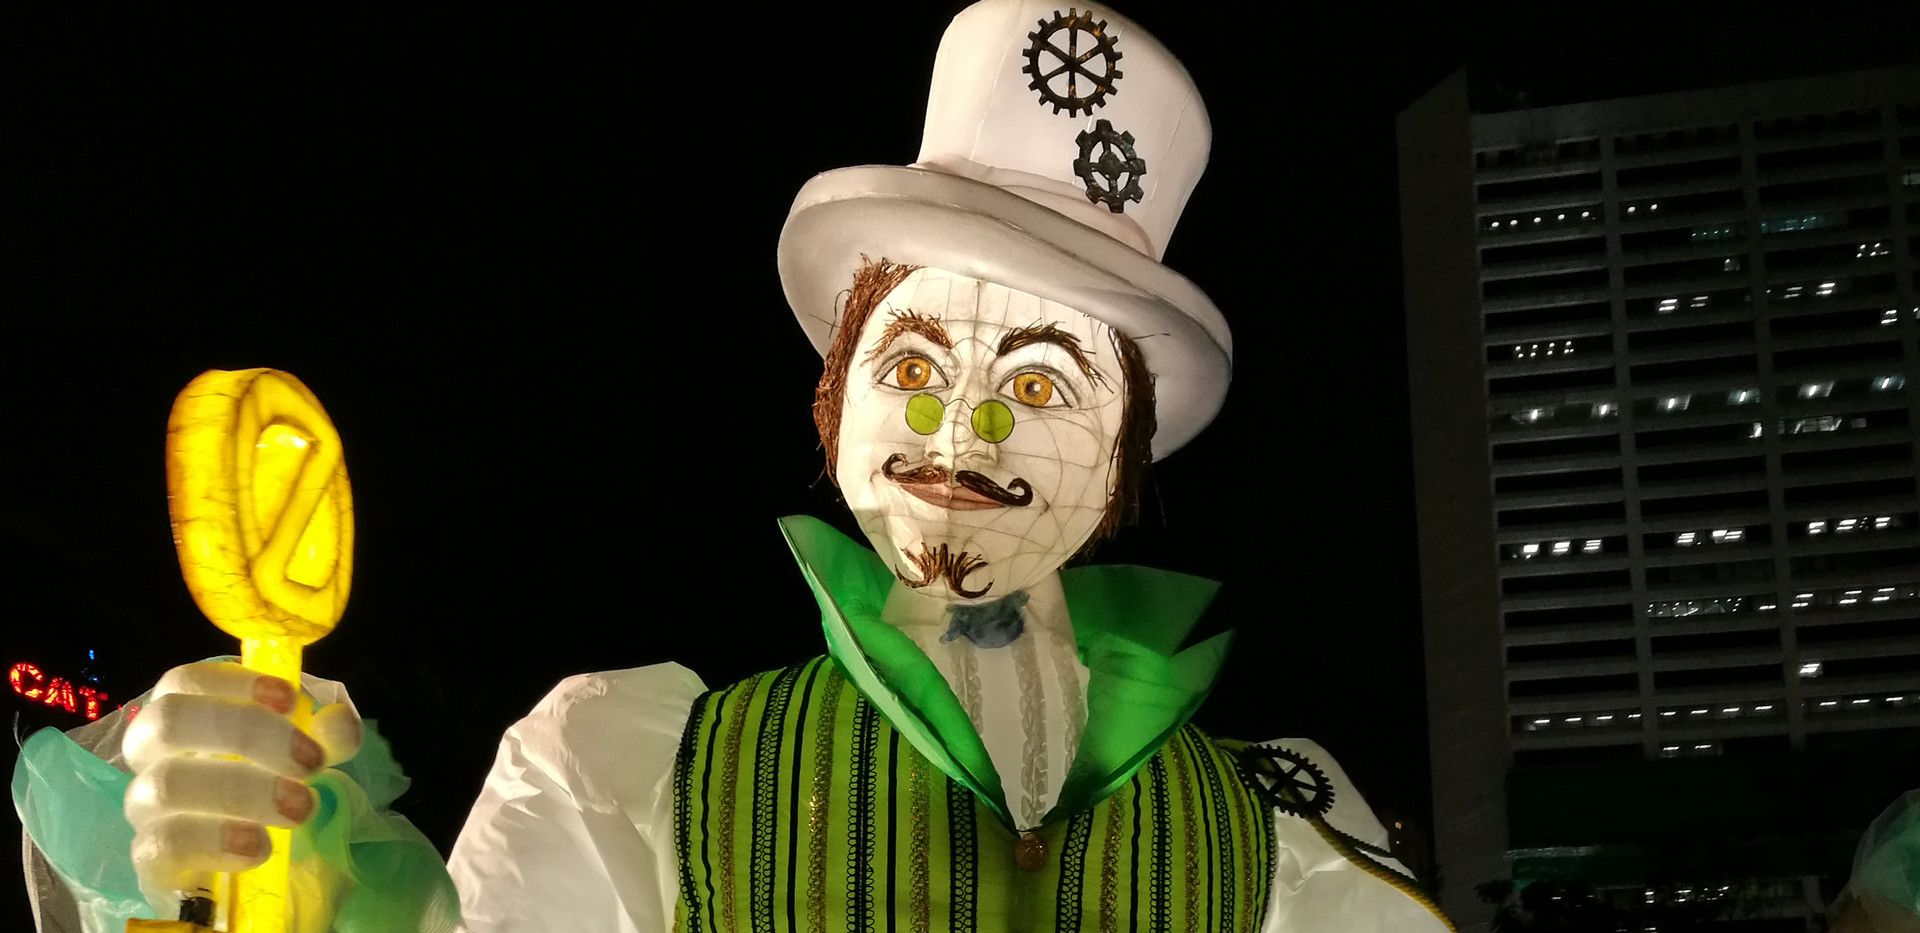 Wizard of Oz Lantern Puppet